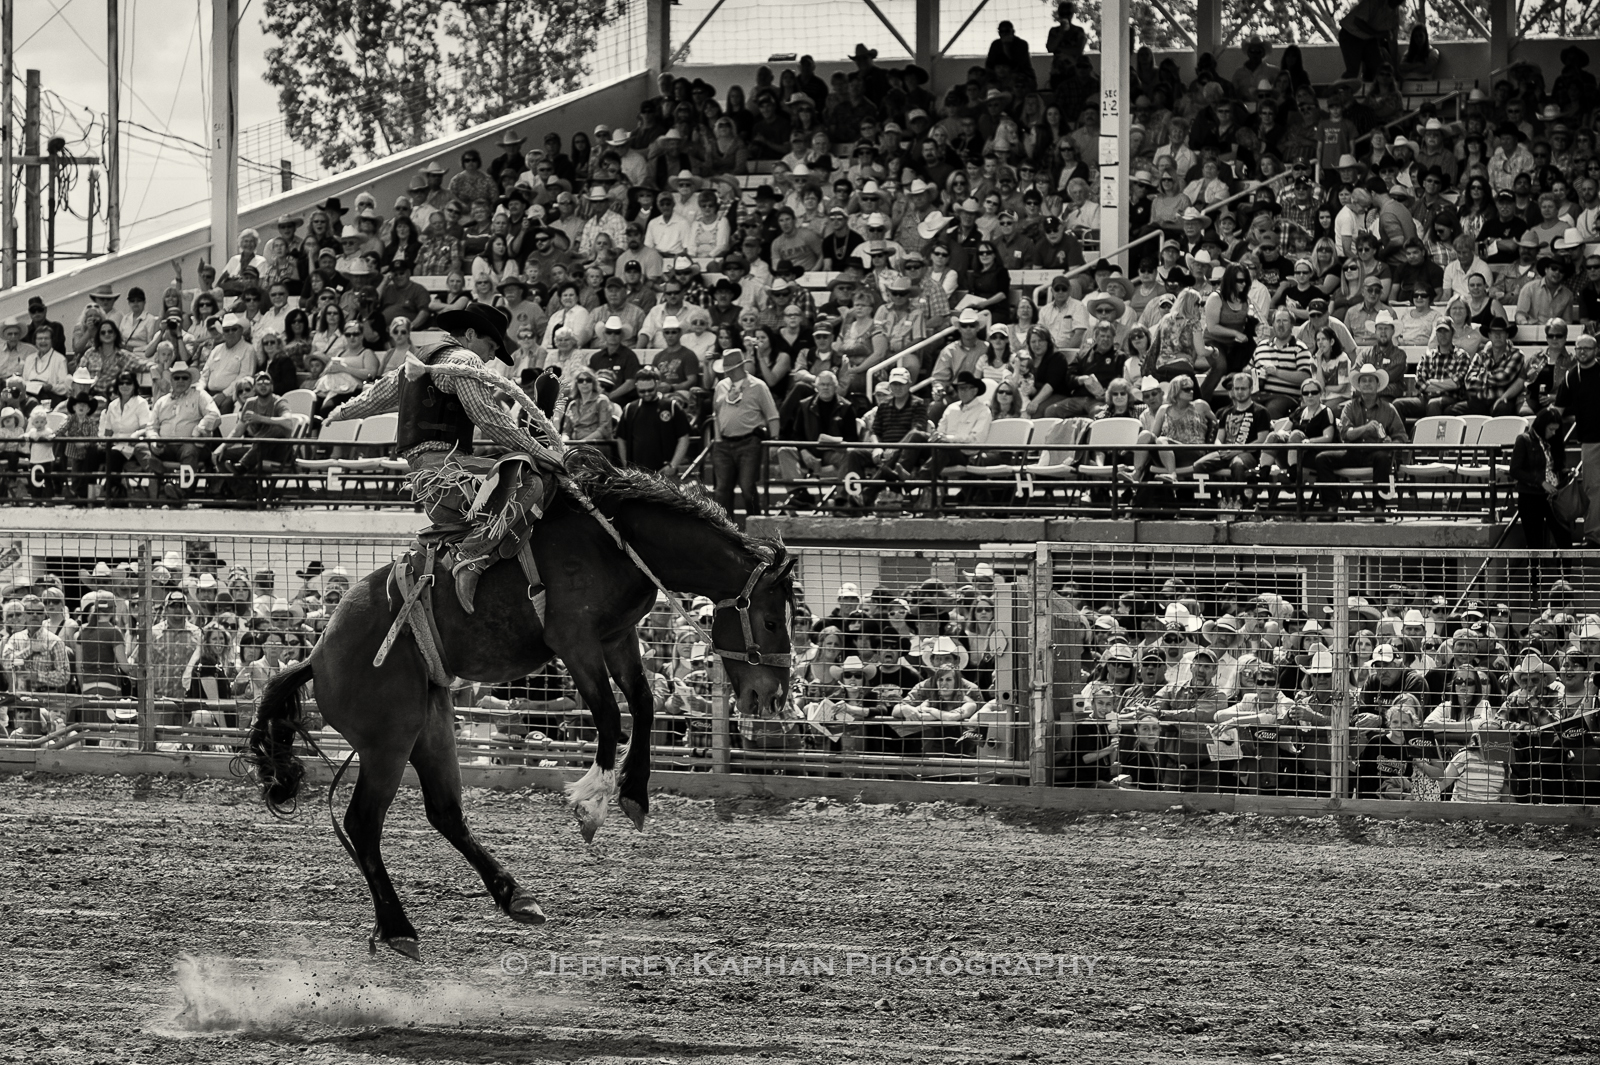 World Famous Bucking Horse Sale bronc rider